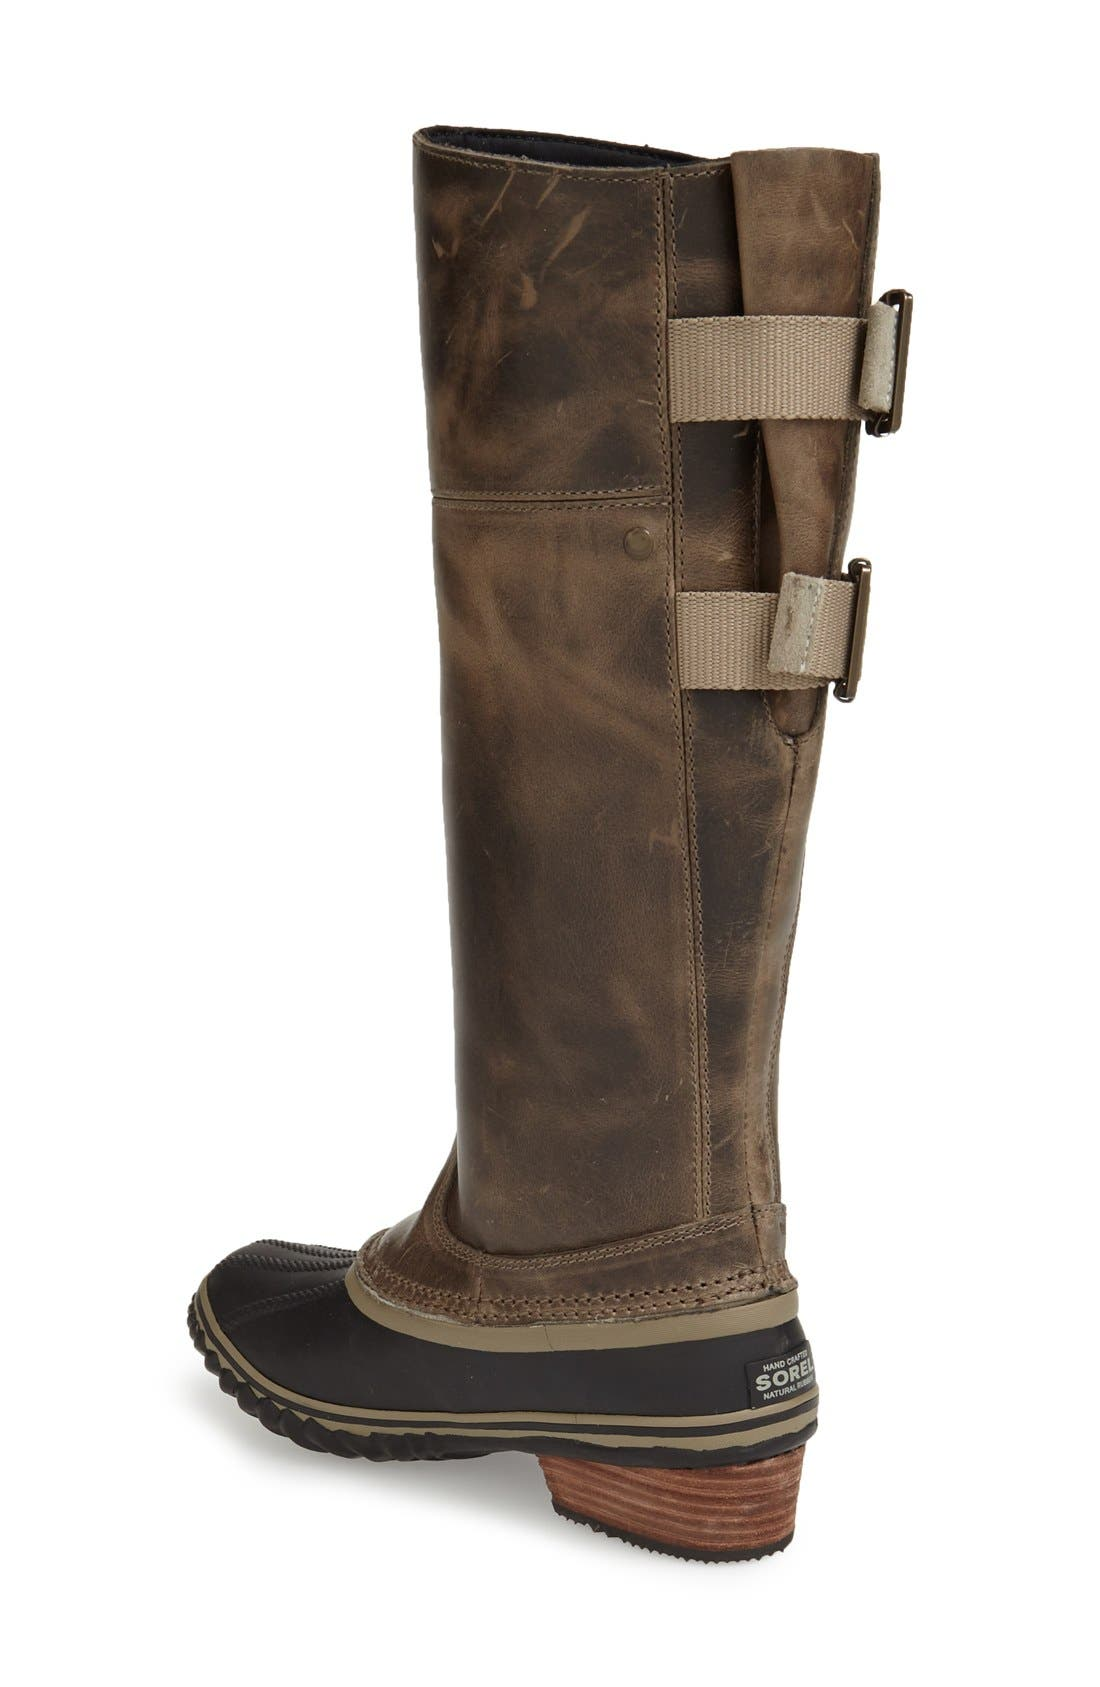 Alternate Image 2  - SOREL 'Slimpack II' Waterproof Riding Boot (Women)